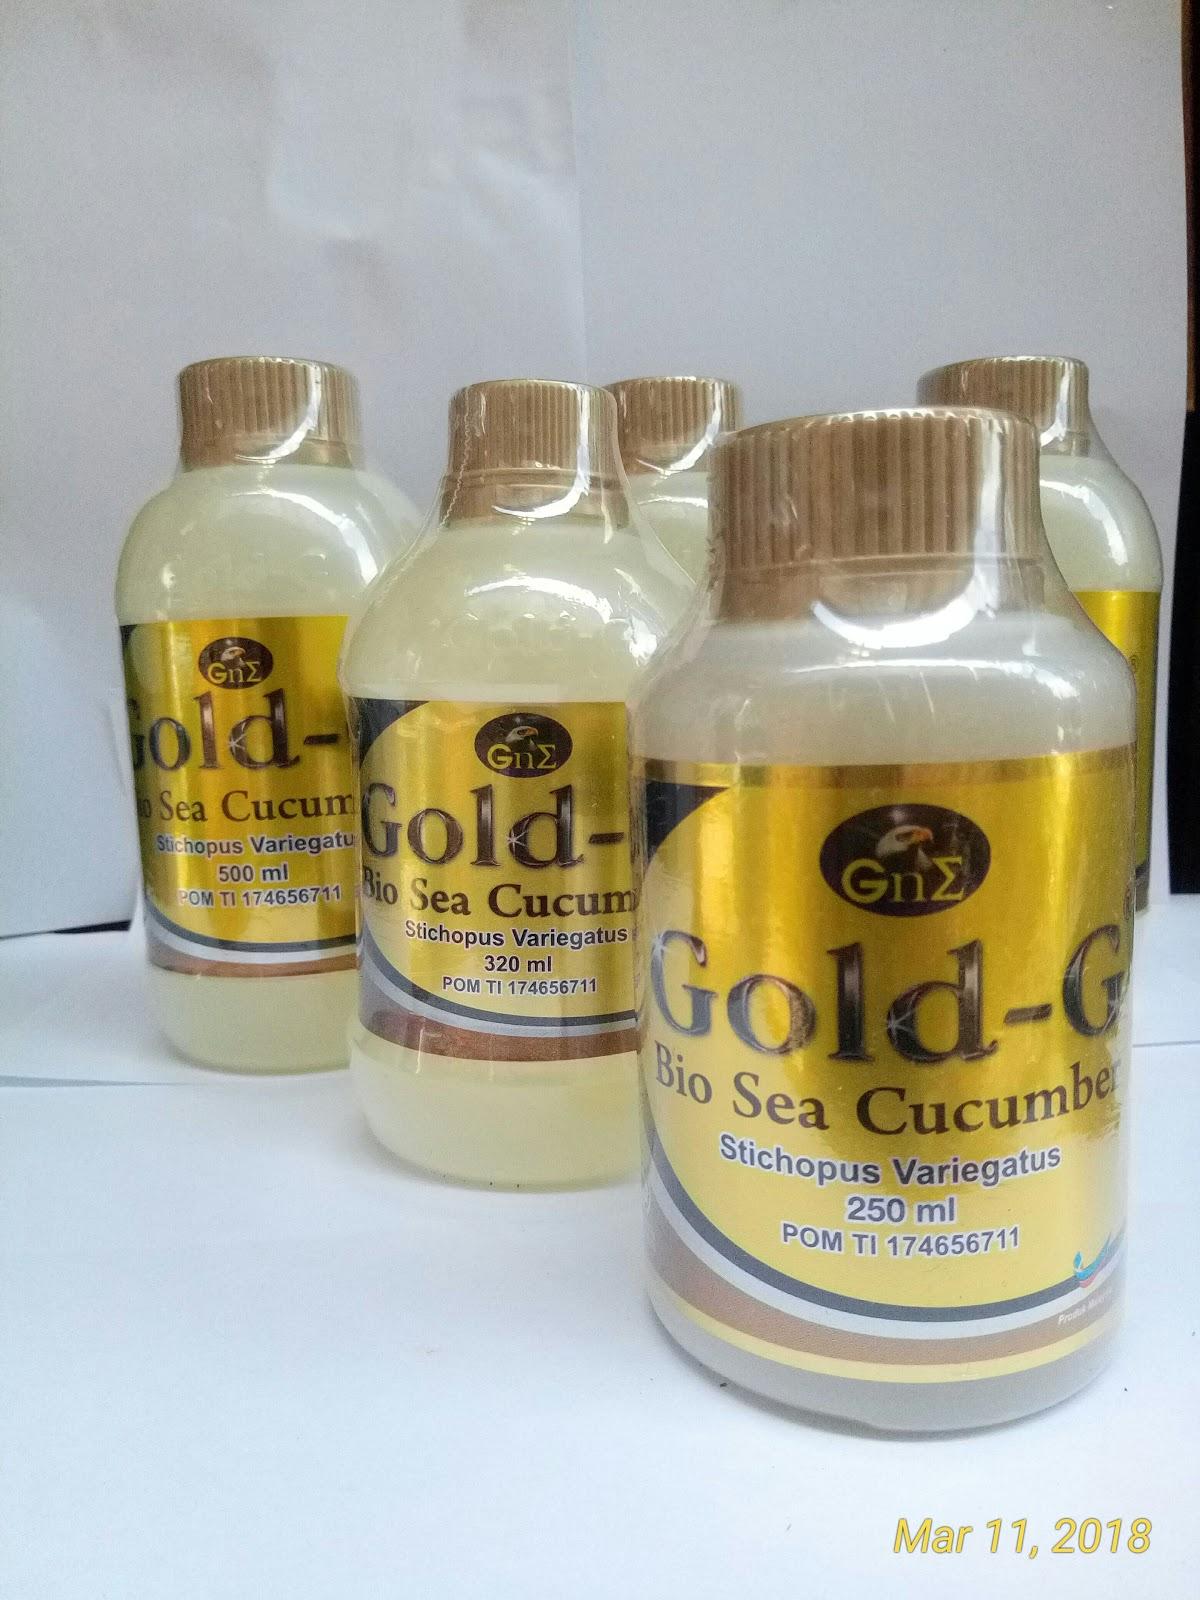 Gold G Jelly Gamat Isi 320 Ml Daftar Harga Terkini Termurah Dan 500 250ml320ml500ml Walit 500ml Turun